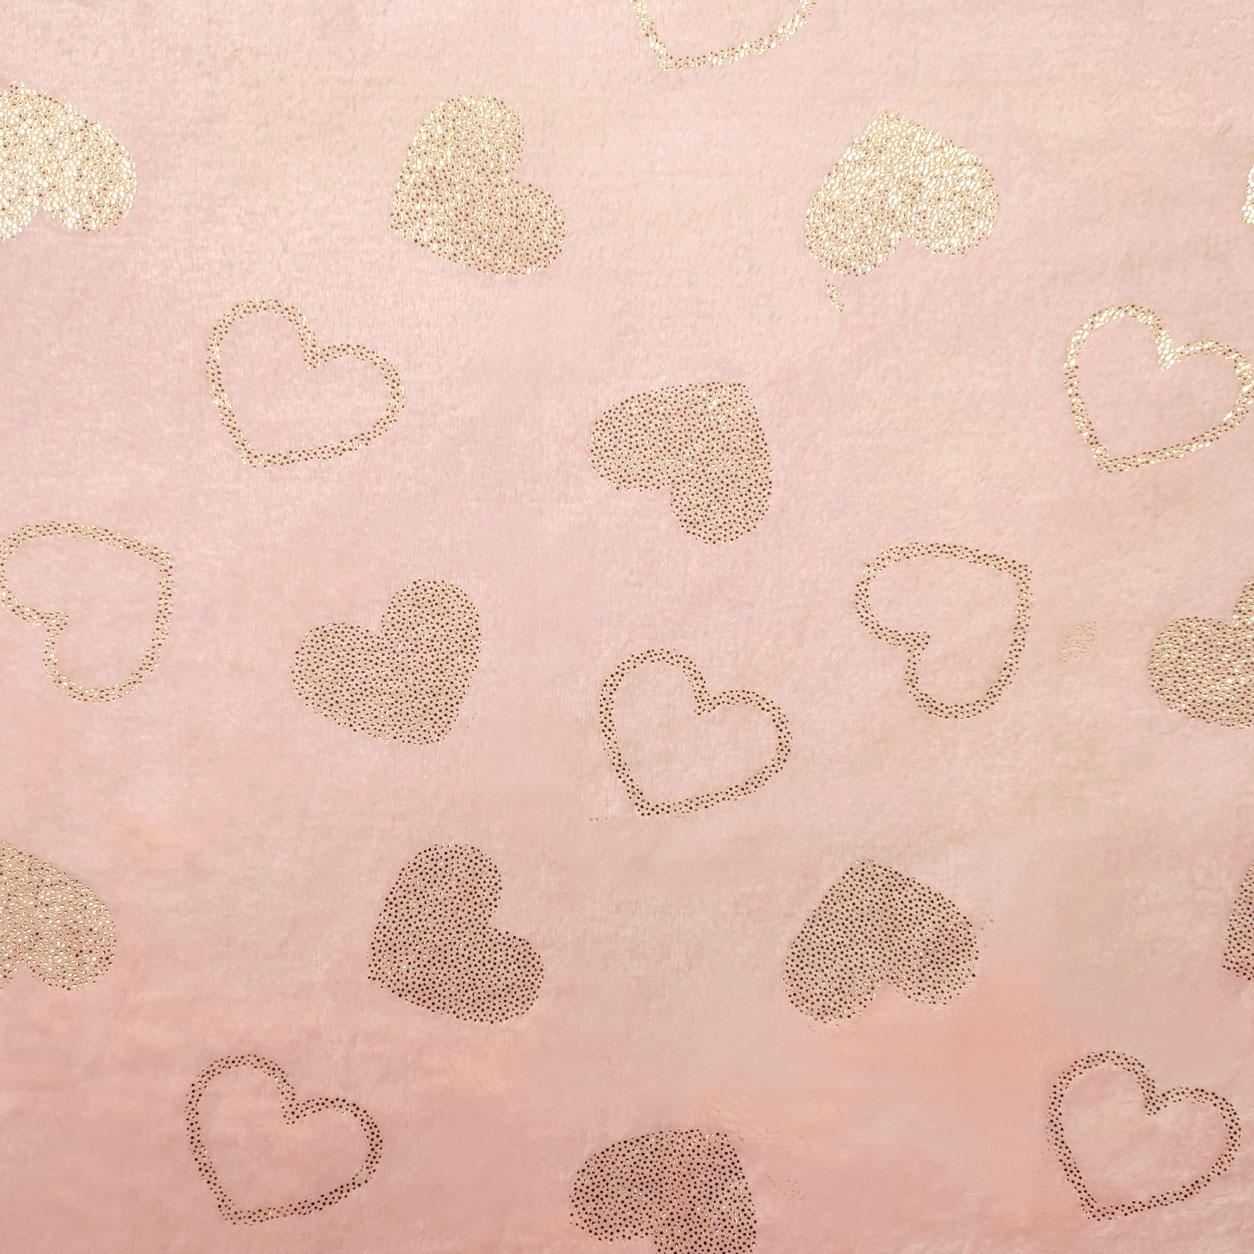 Pile Mano Cachemire Rosa Baby Cuori Oro